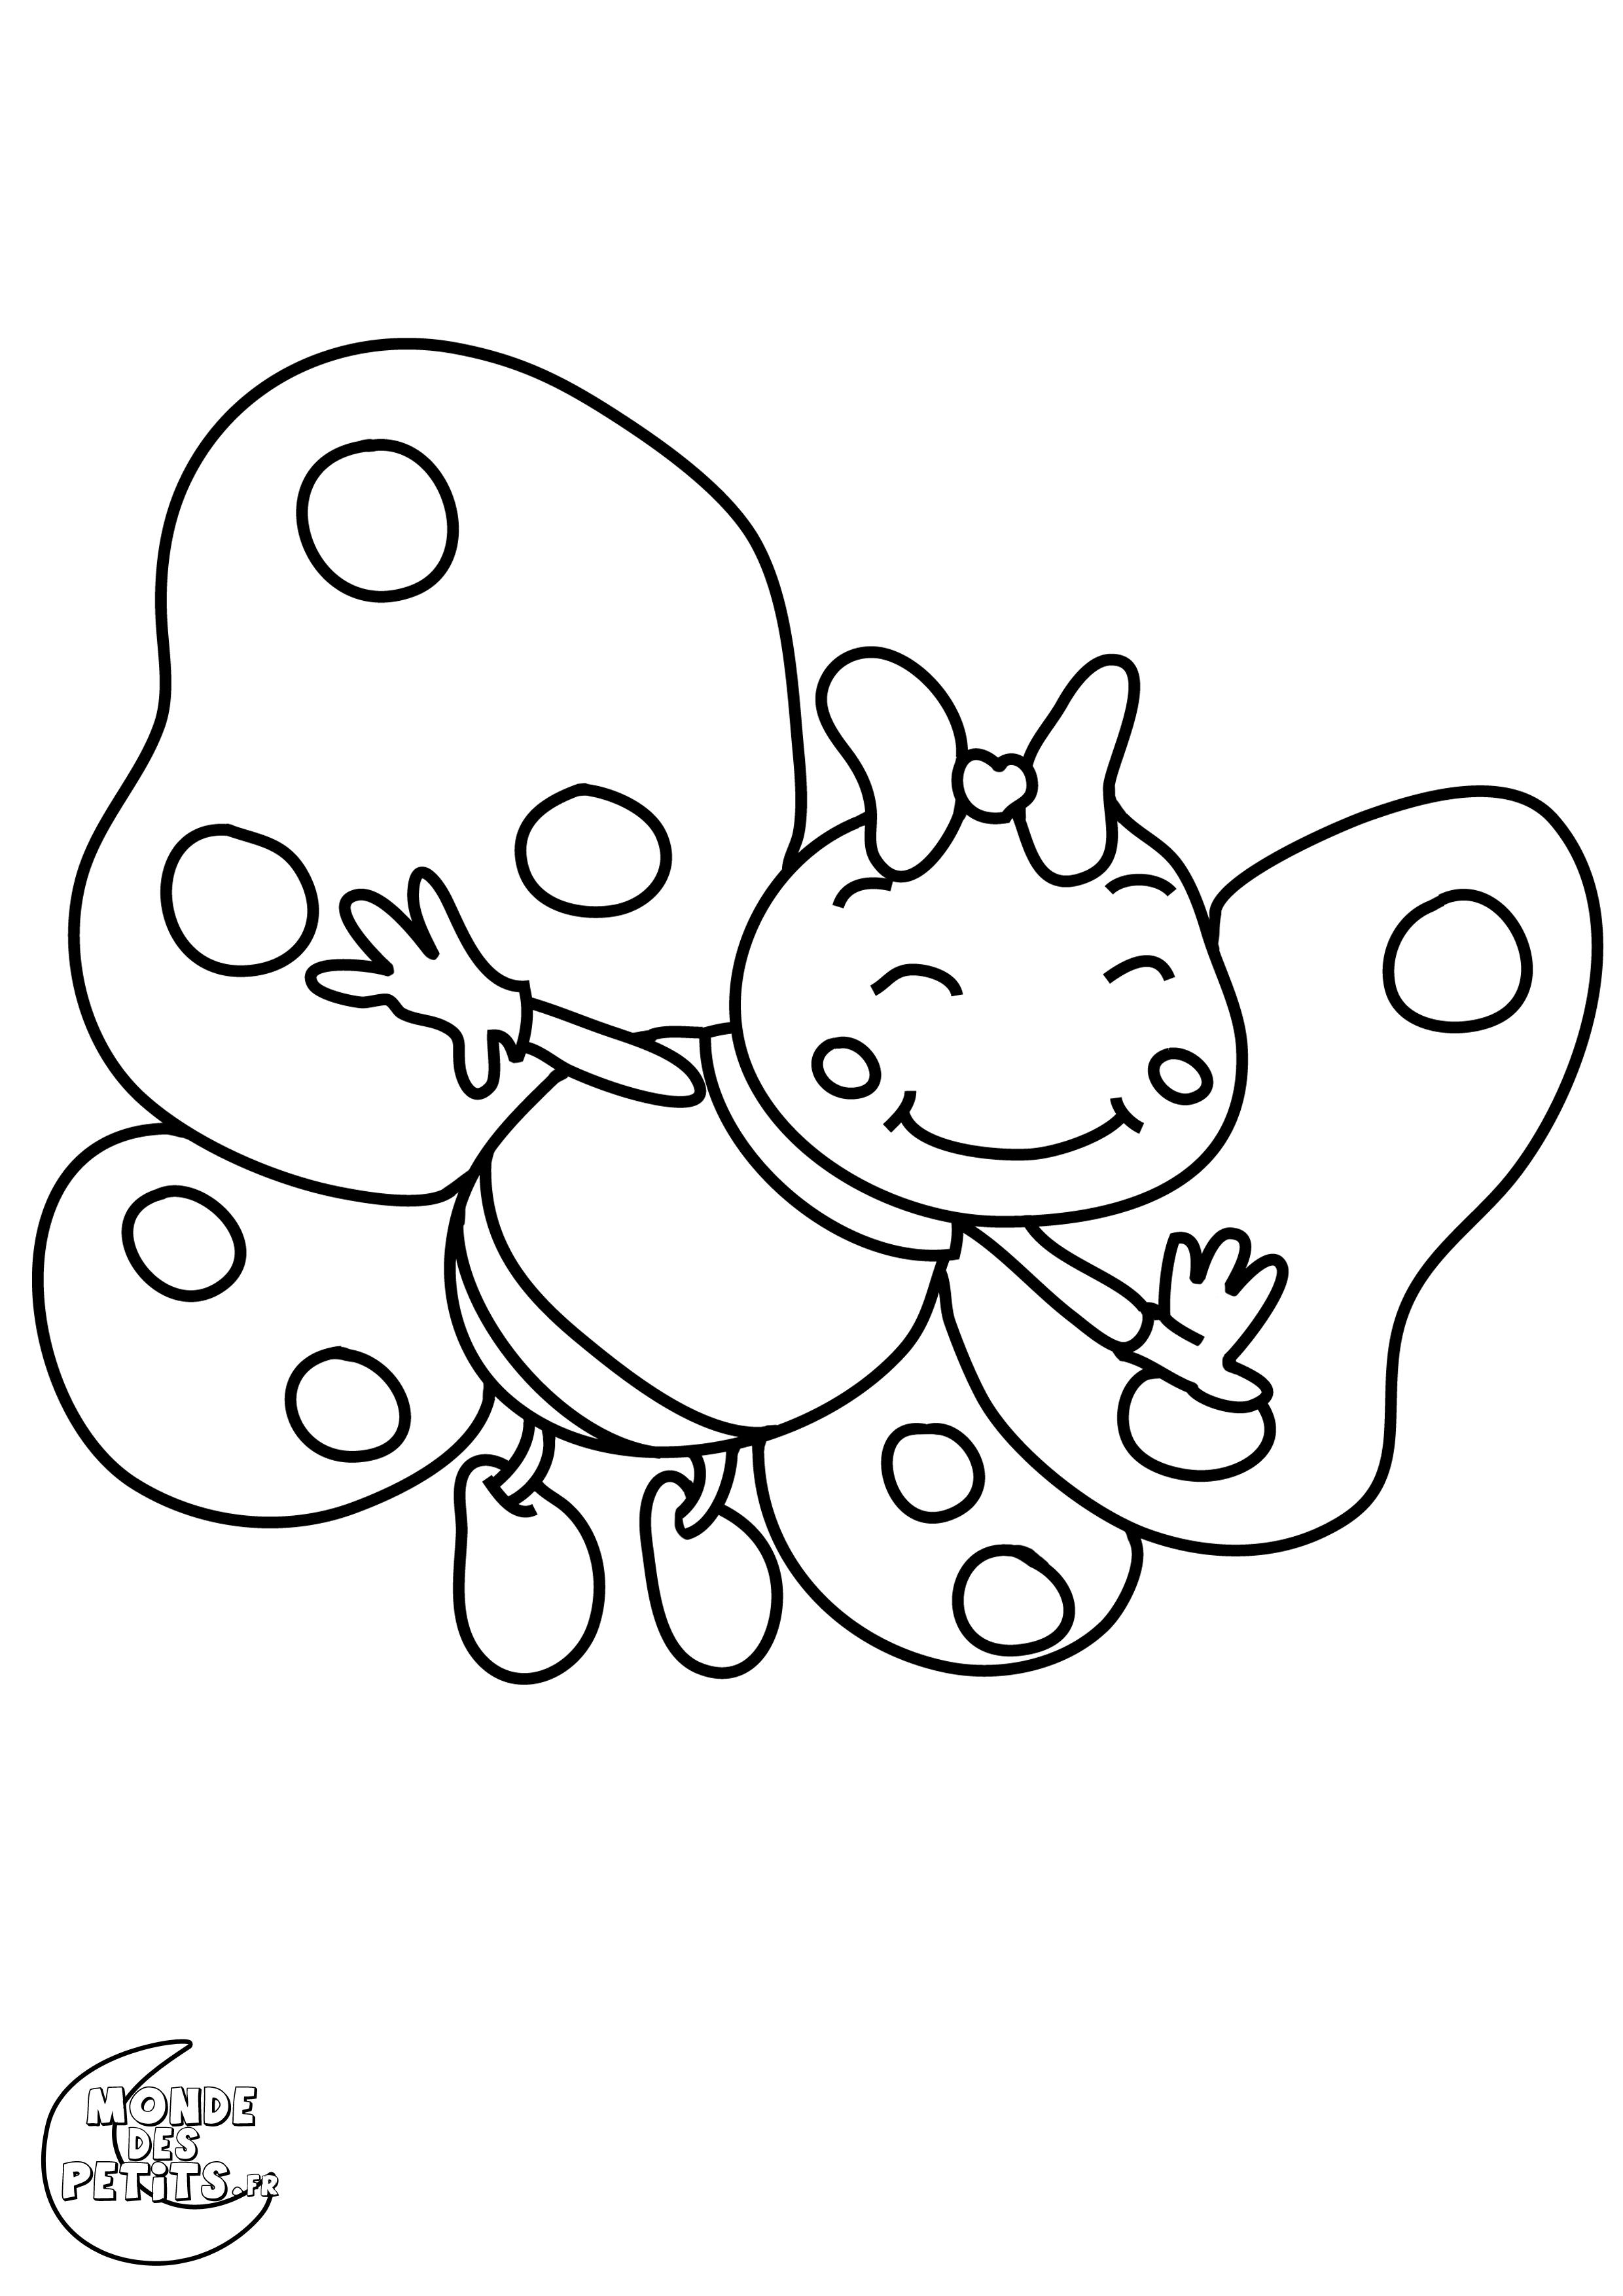 Coloriage Prenom Hugo L Escargot | Imprimer Et Obtenir Une tout Dessin Hugo L Escargot